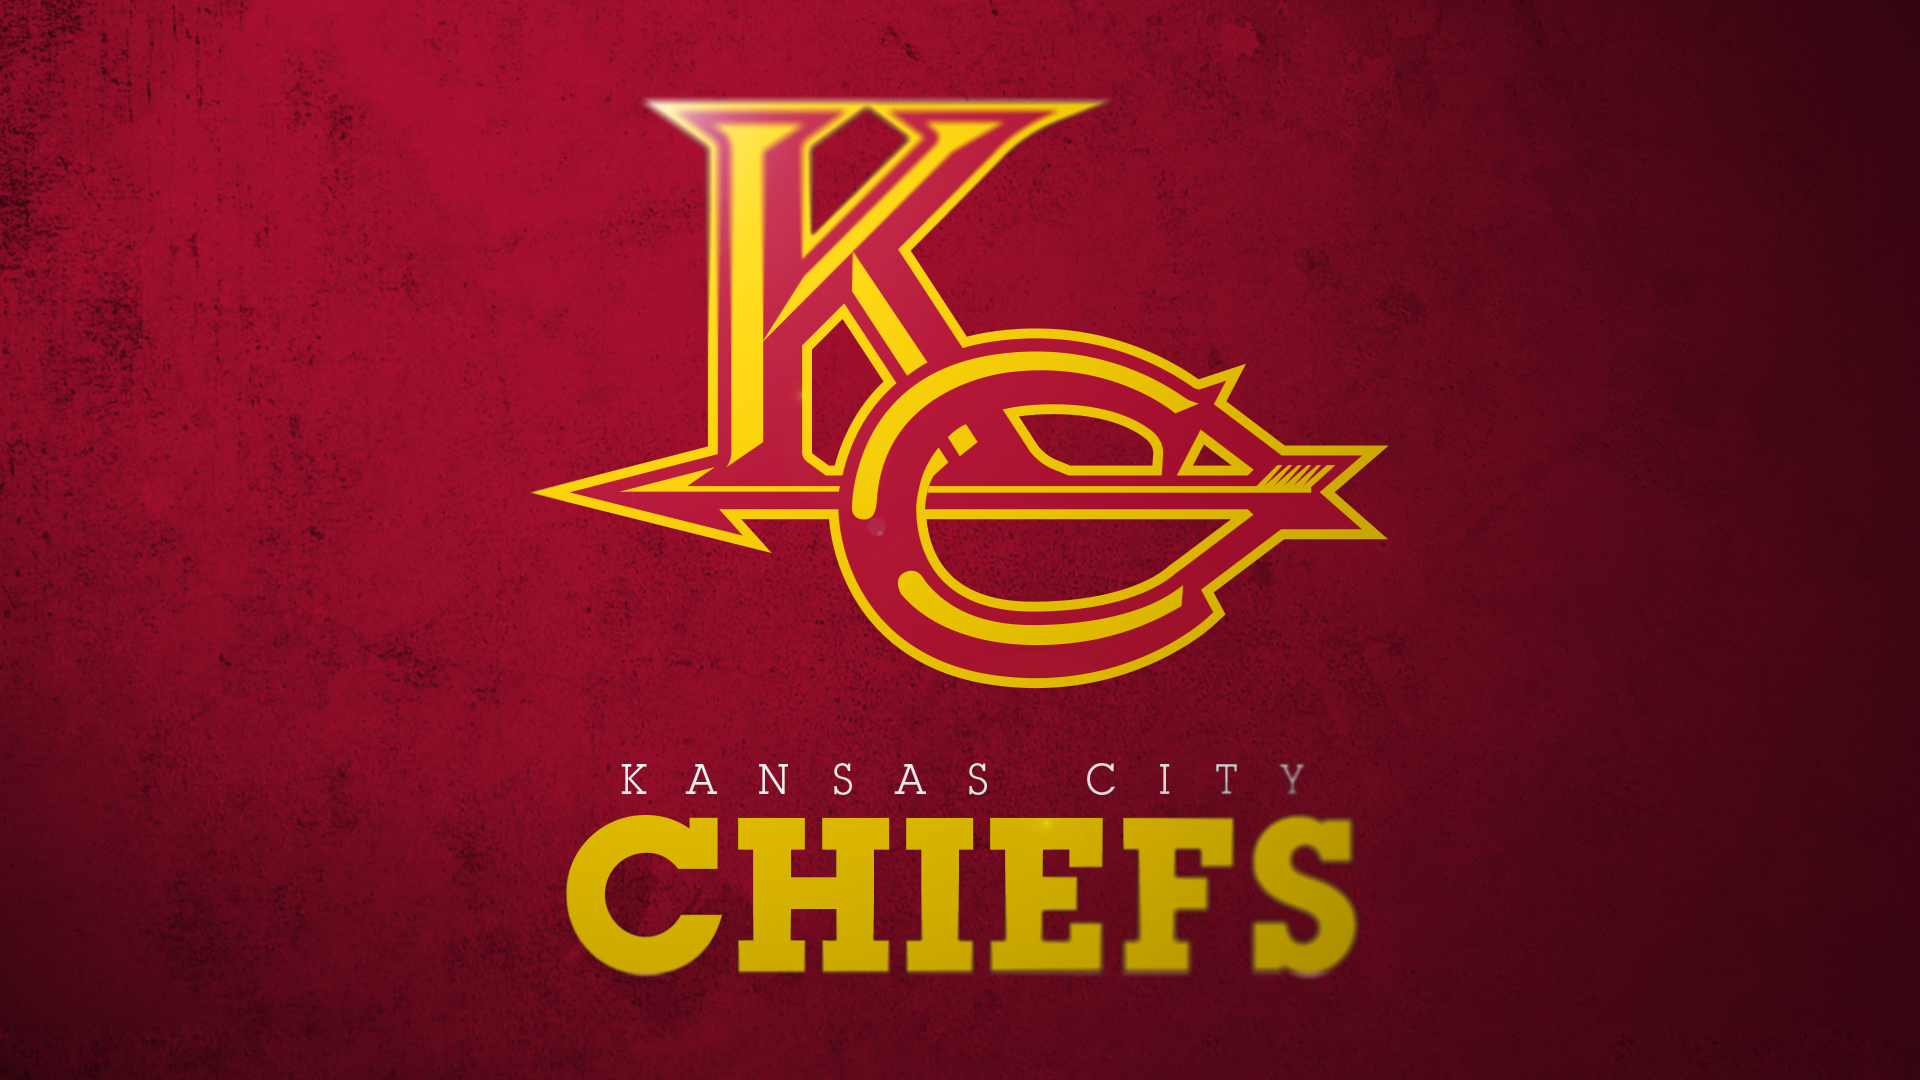 Travel Agency Wallpaper Hd Kansas City Chiefs Logo Wallpaper Pixelstalk Net